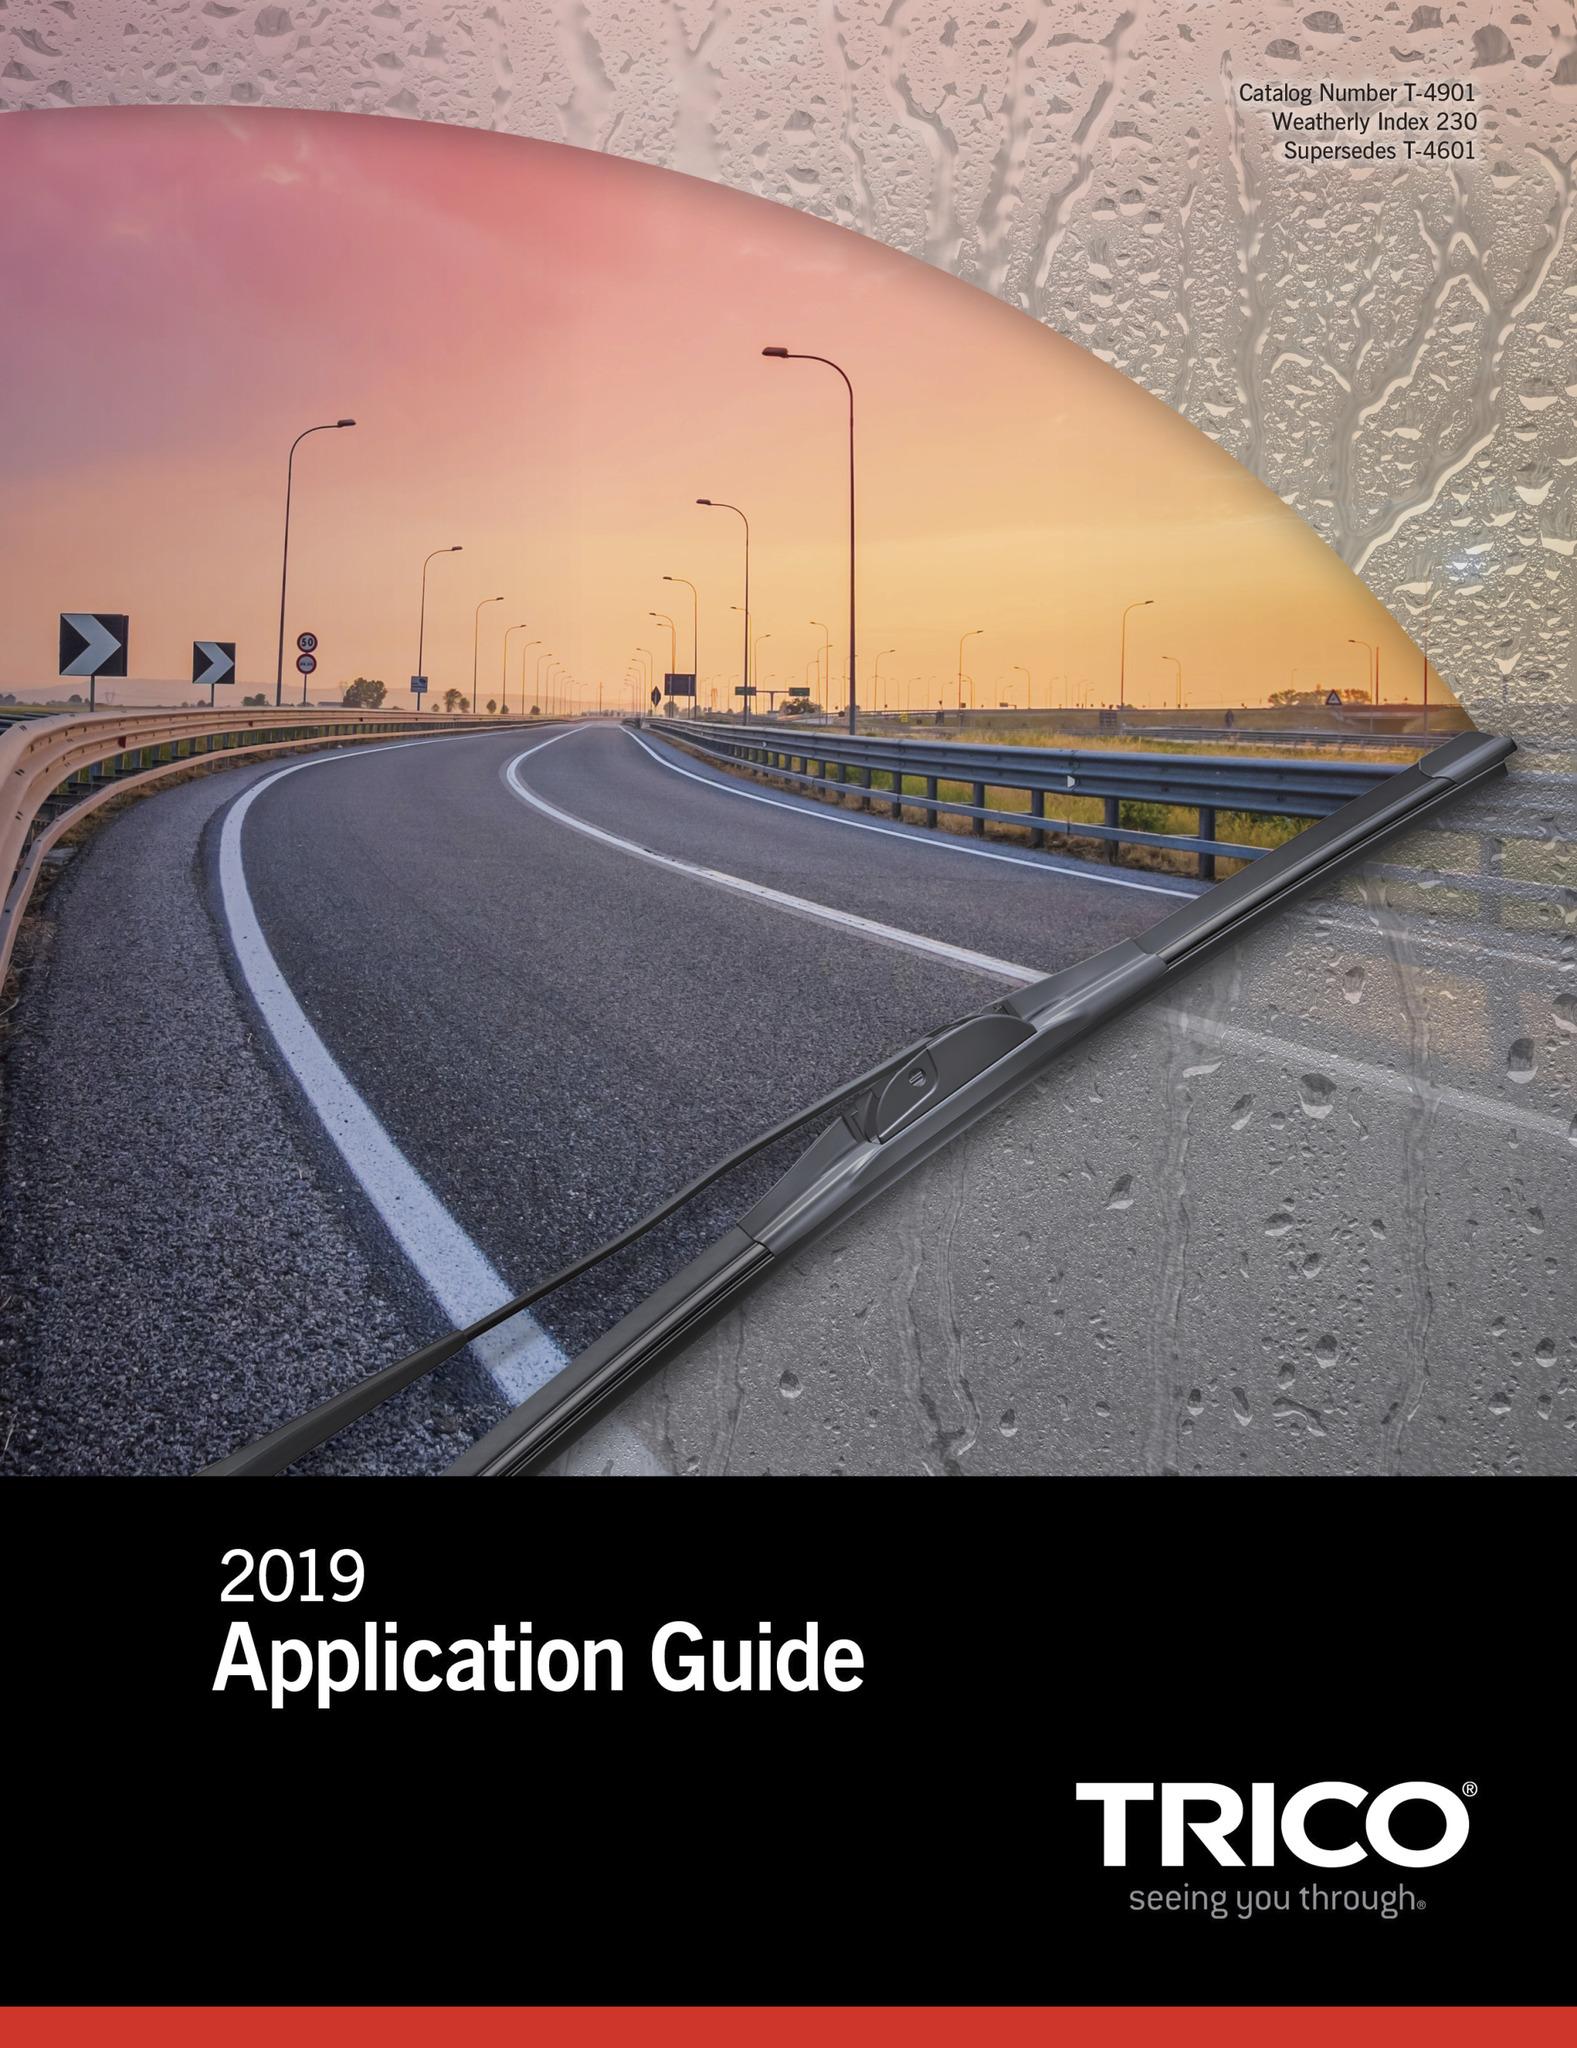 Trico Releases 2019 U.S. Automotive Application Guide